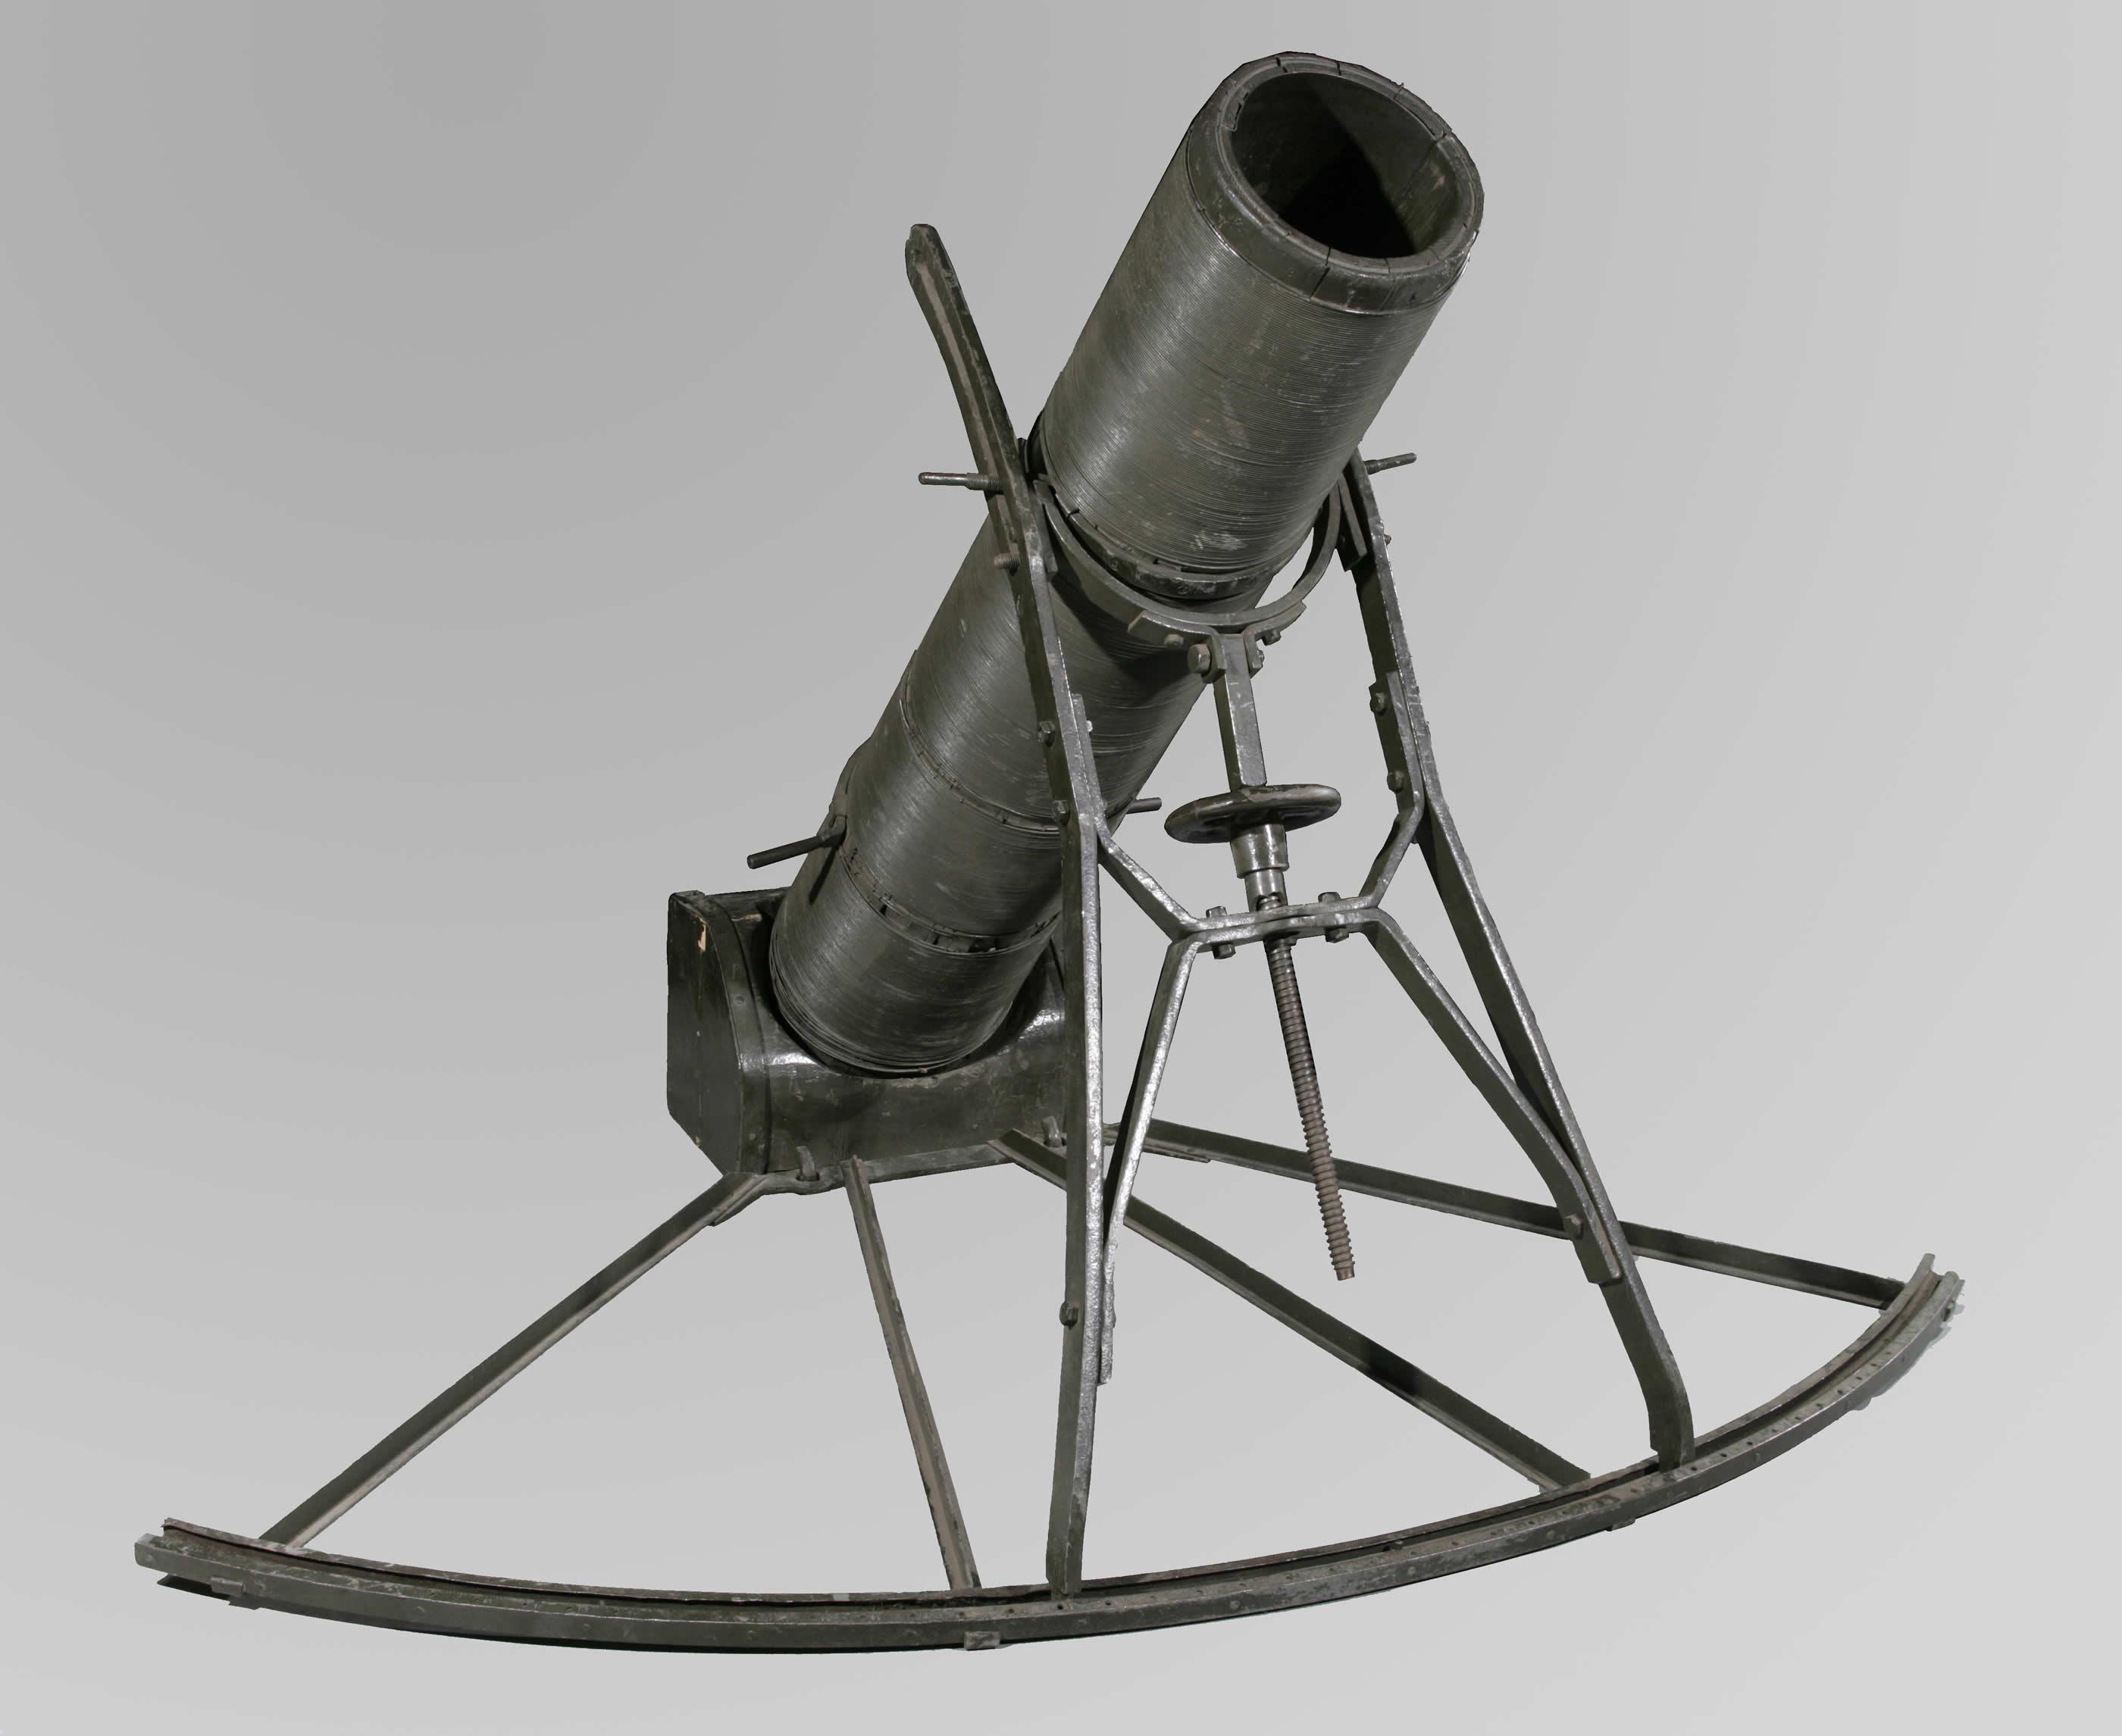 German 240 millimetre Albrecht Trench Mortar